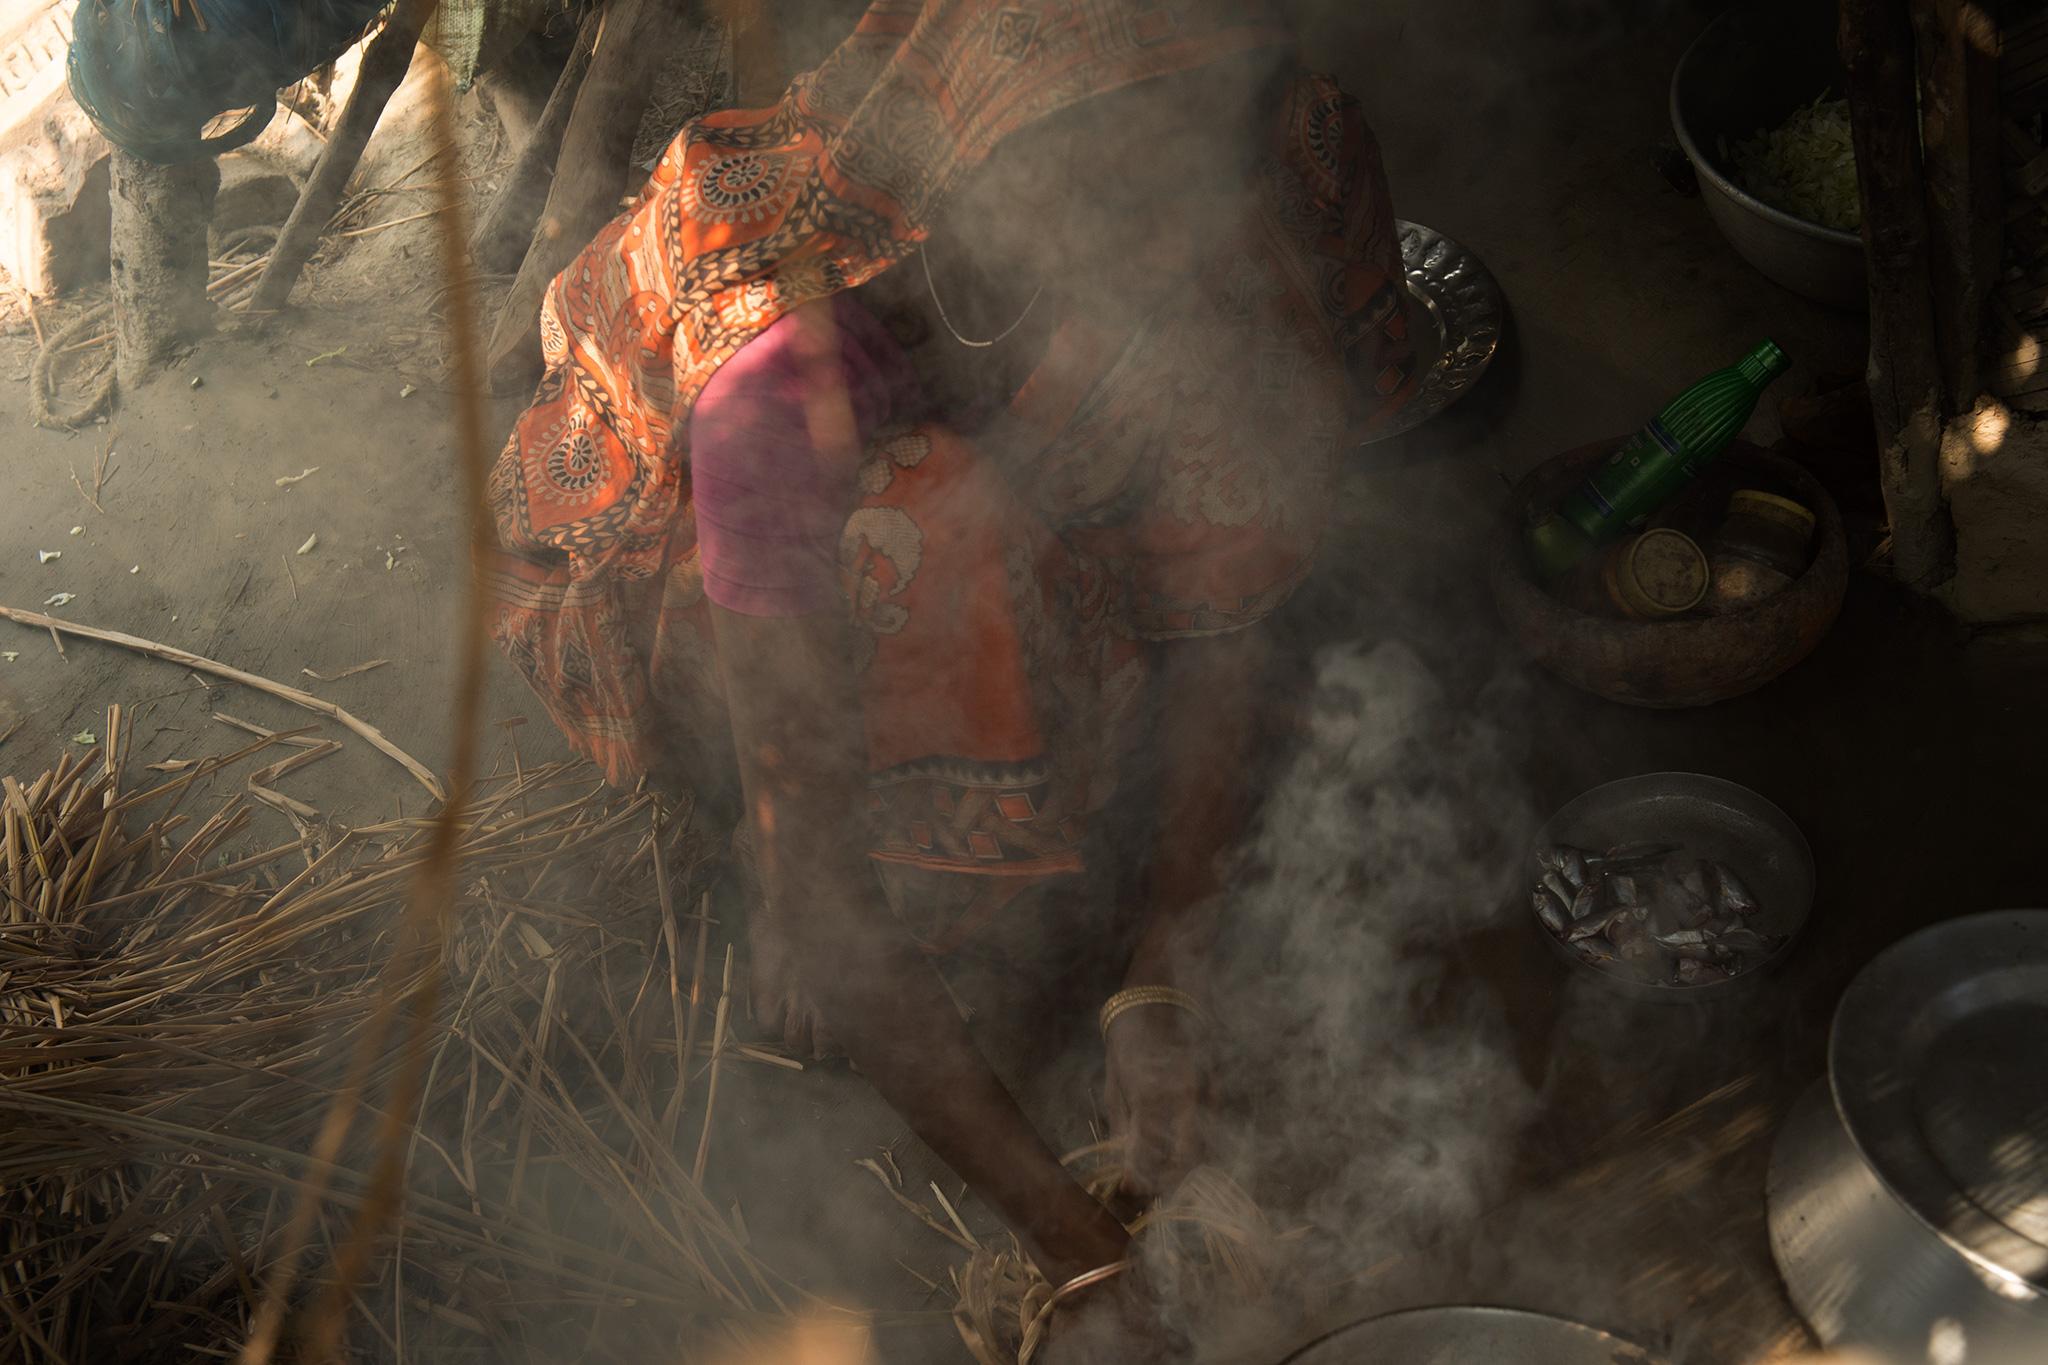 kabita_smoke.jpg